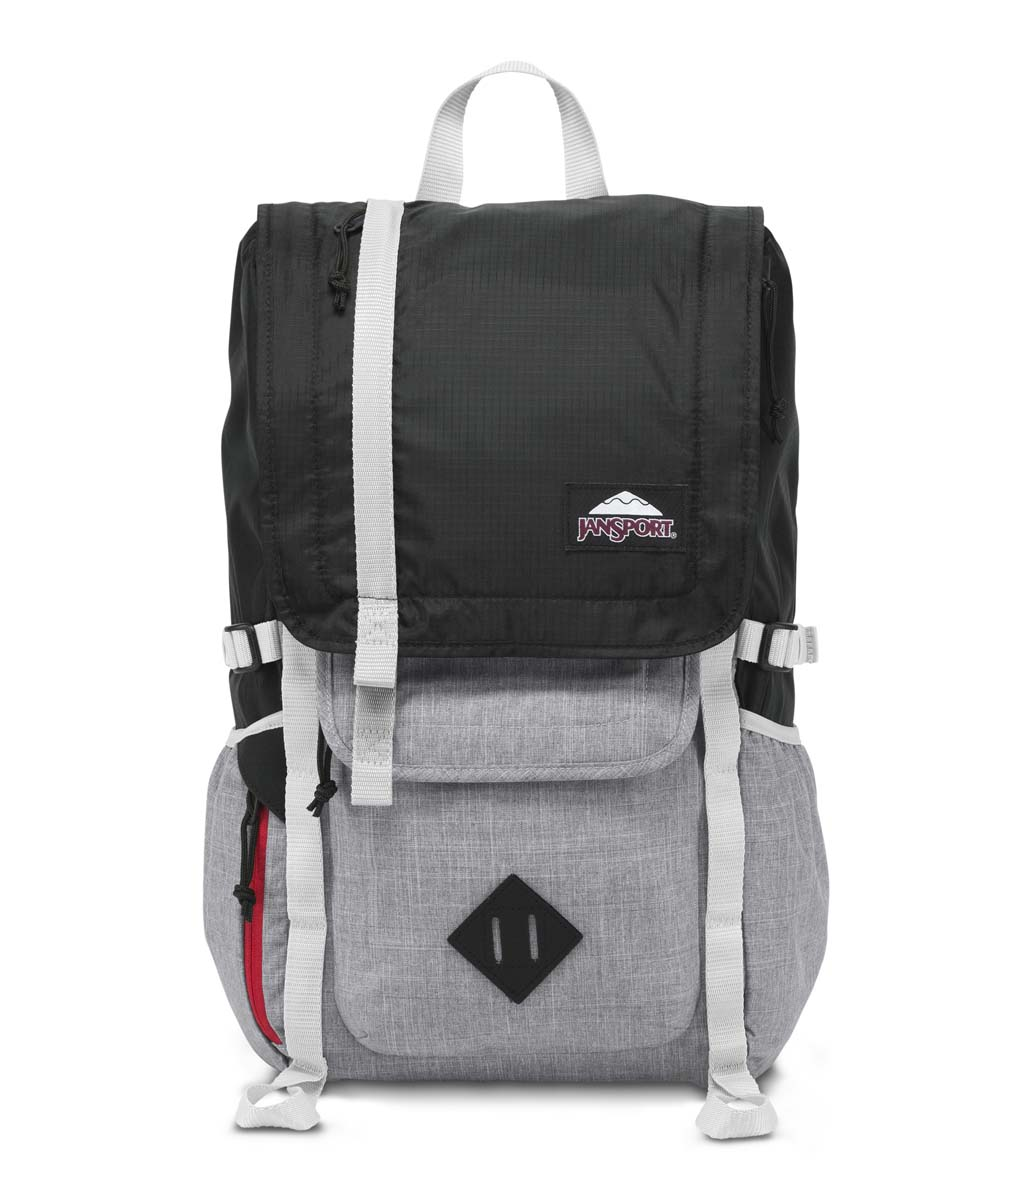 JanSport รุ่น HATCHET DL - Black Poly Ripstop/Grey Marl